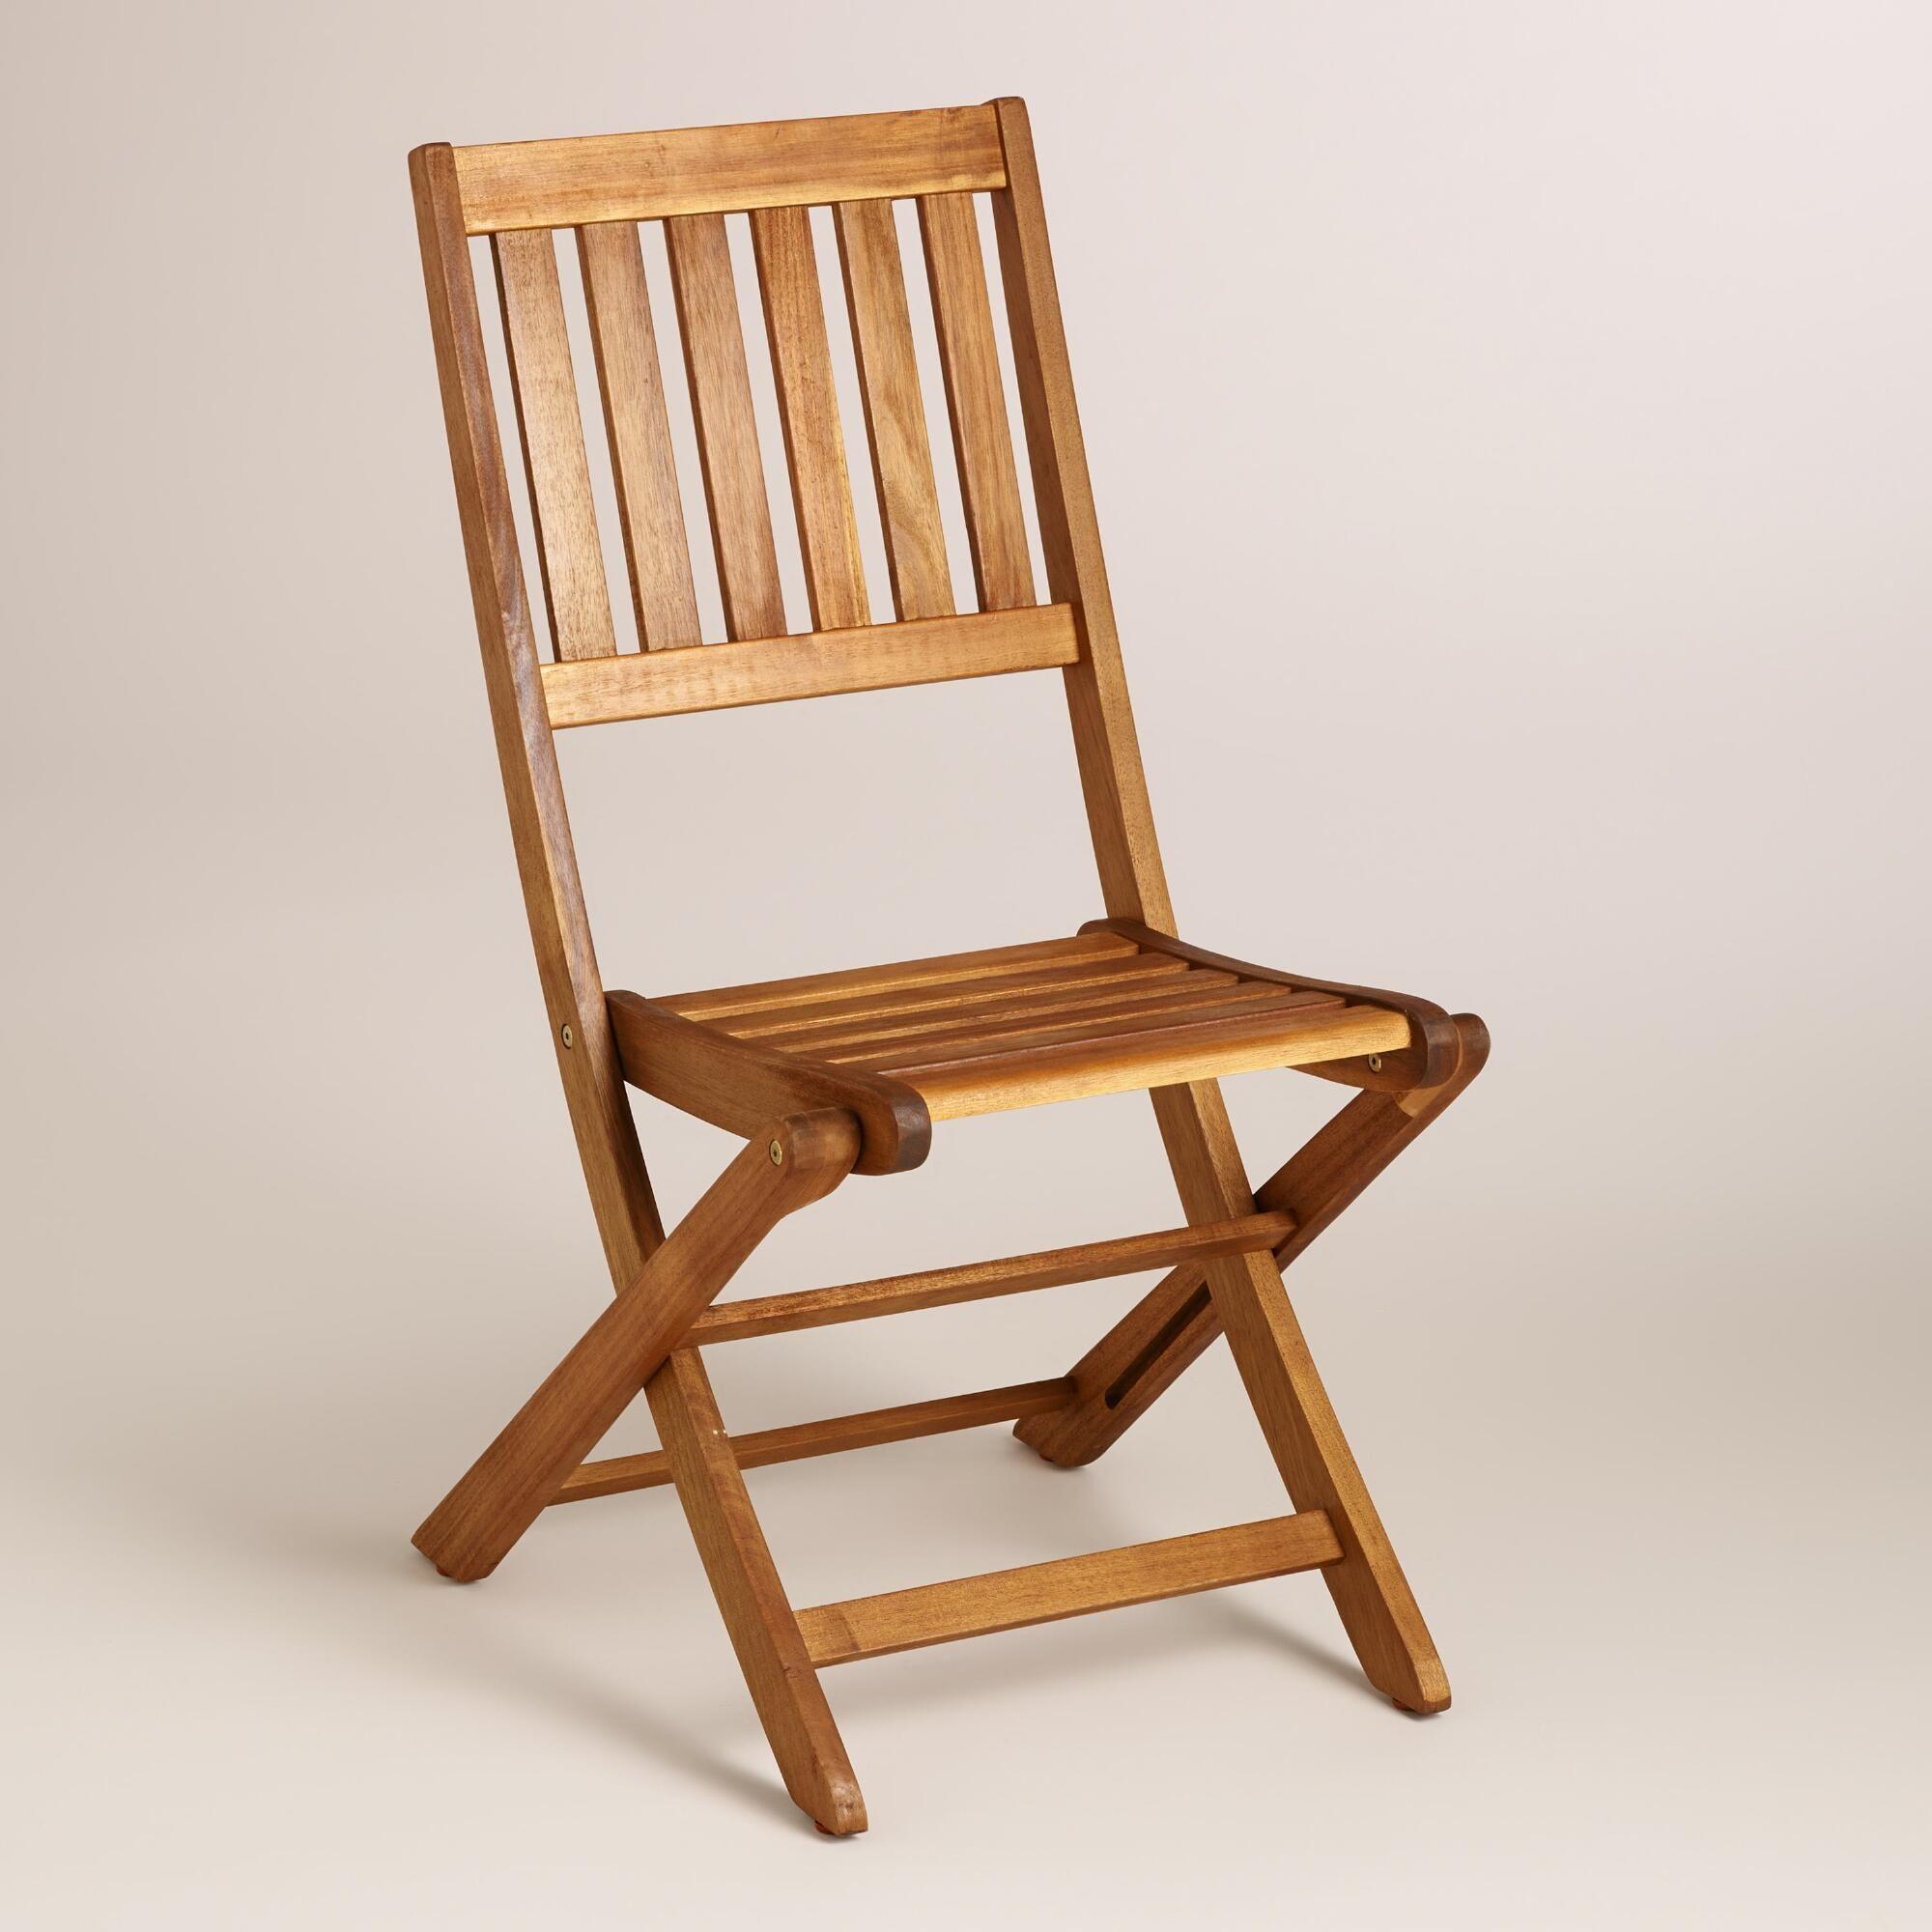 Wood Cameron Folding Chairs Set of 2